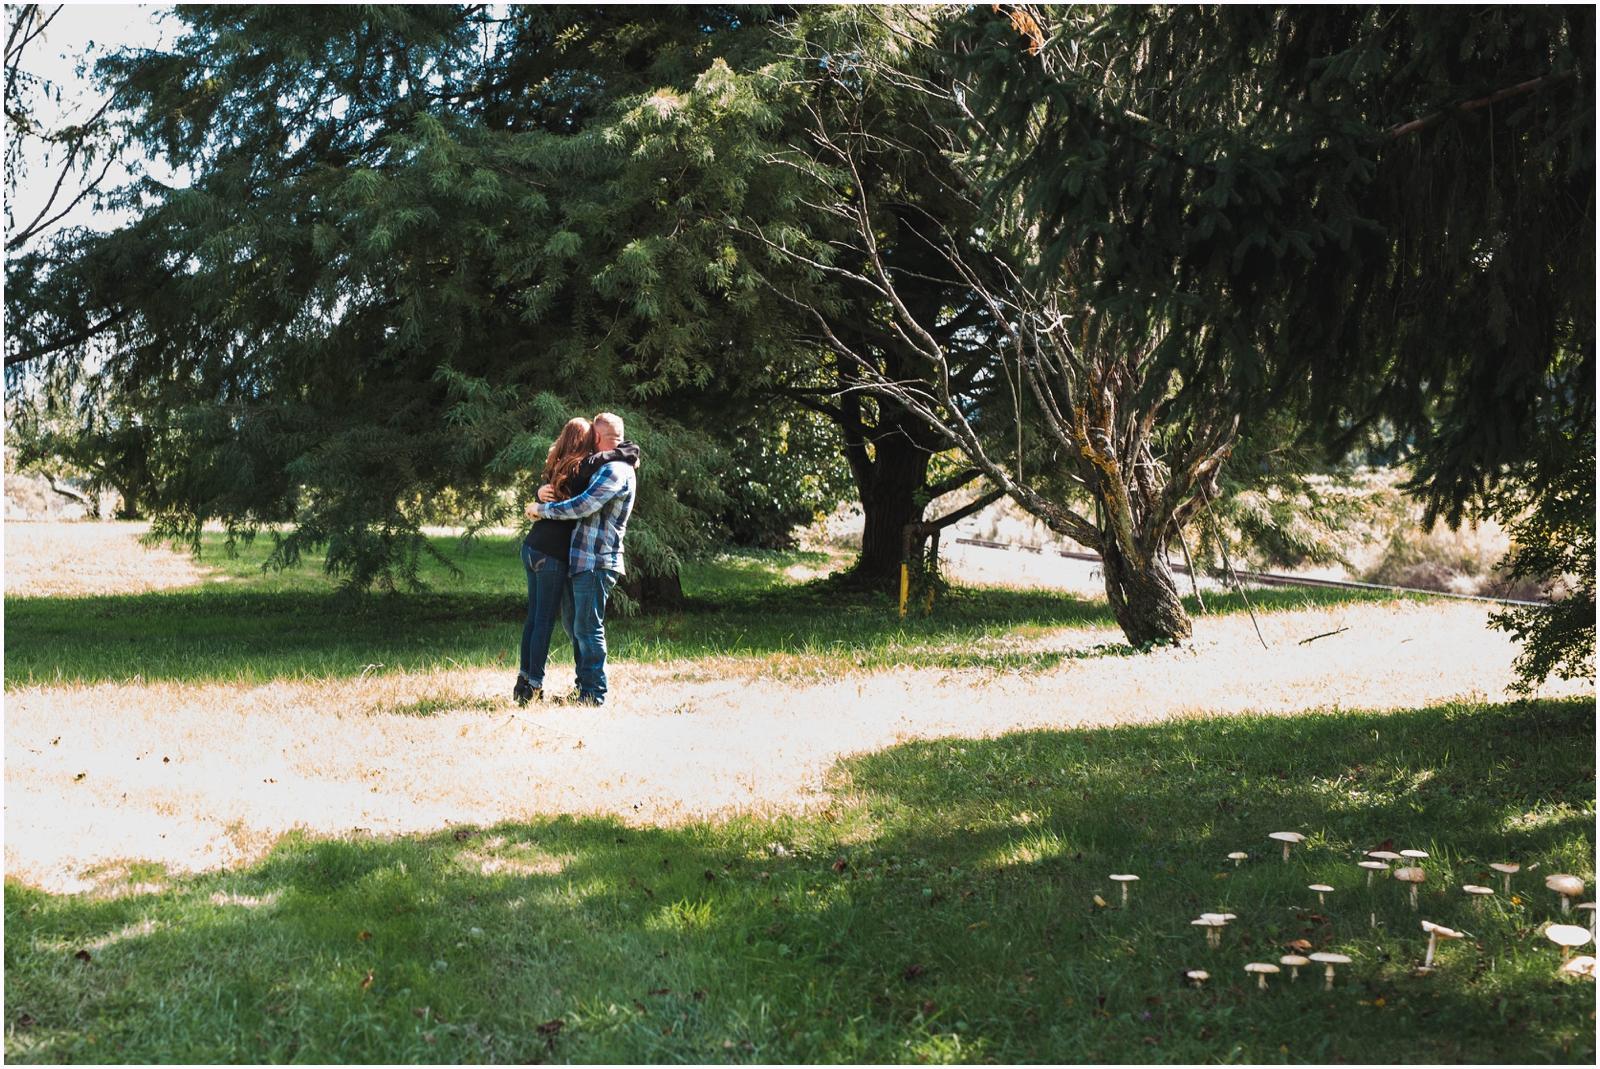 jamie_leonard_photography_proposal_engagement_portrait_mount_pleasant_youngwood_greensburg_winery.jpg